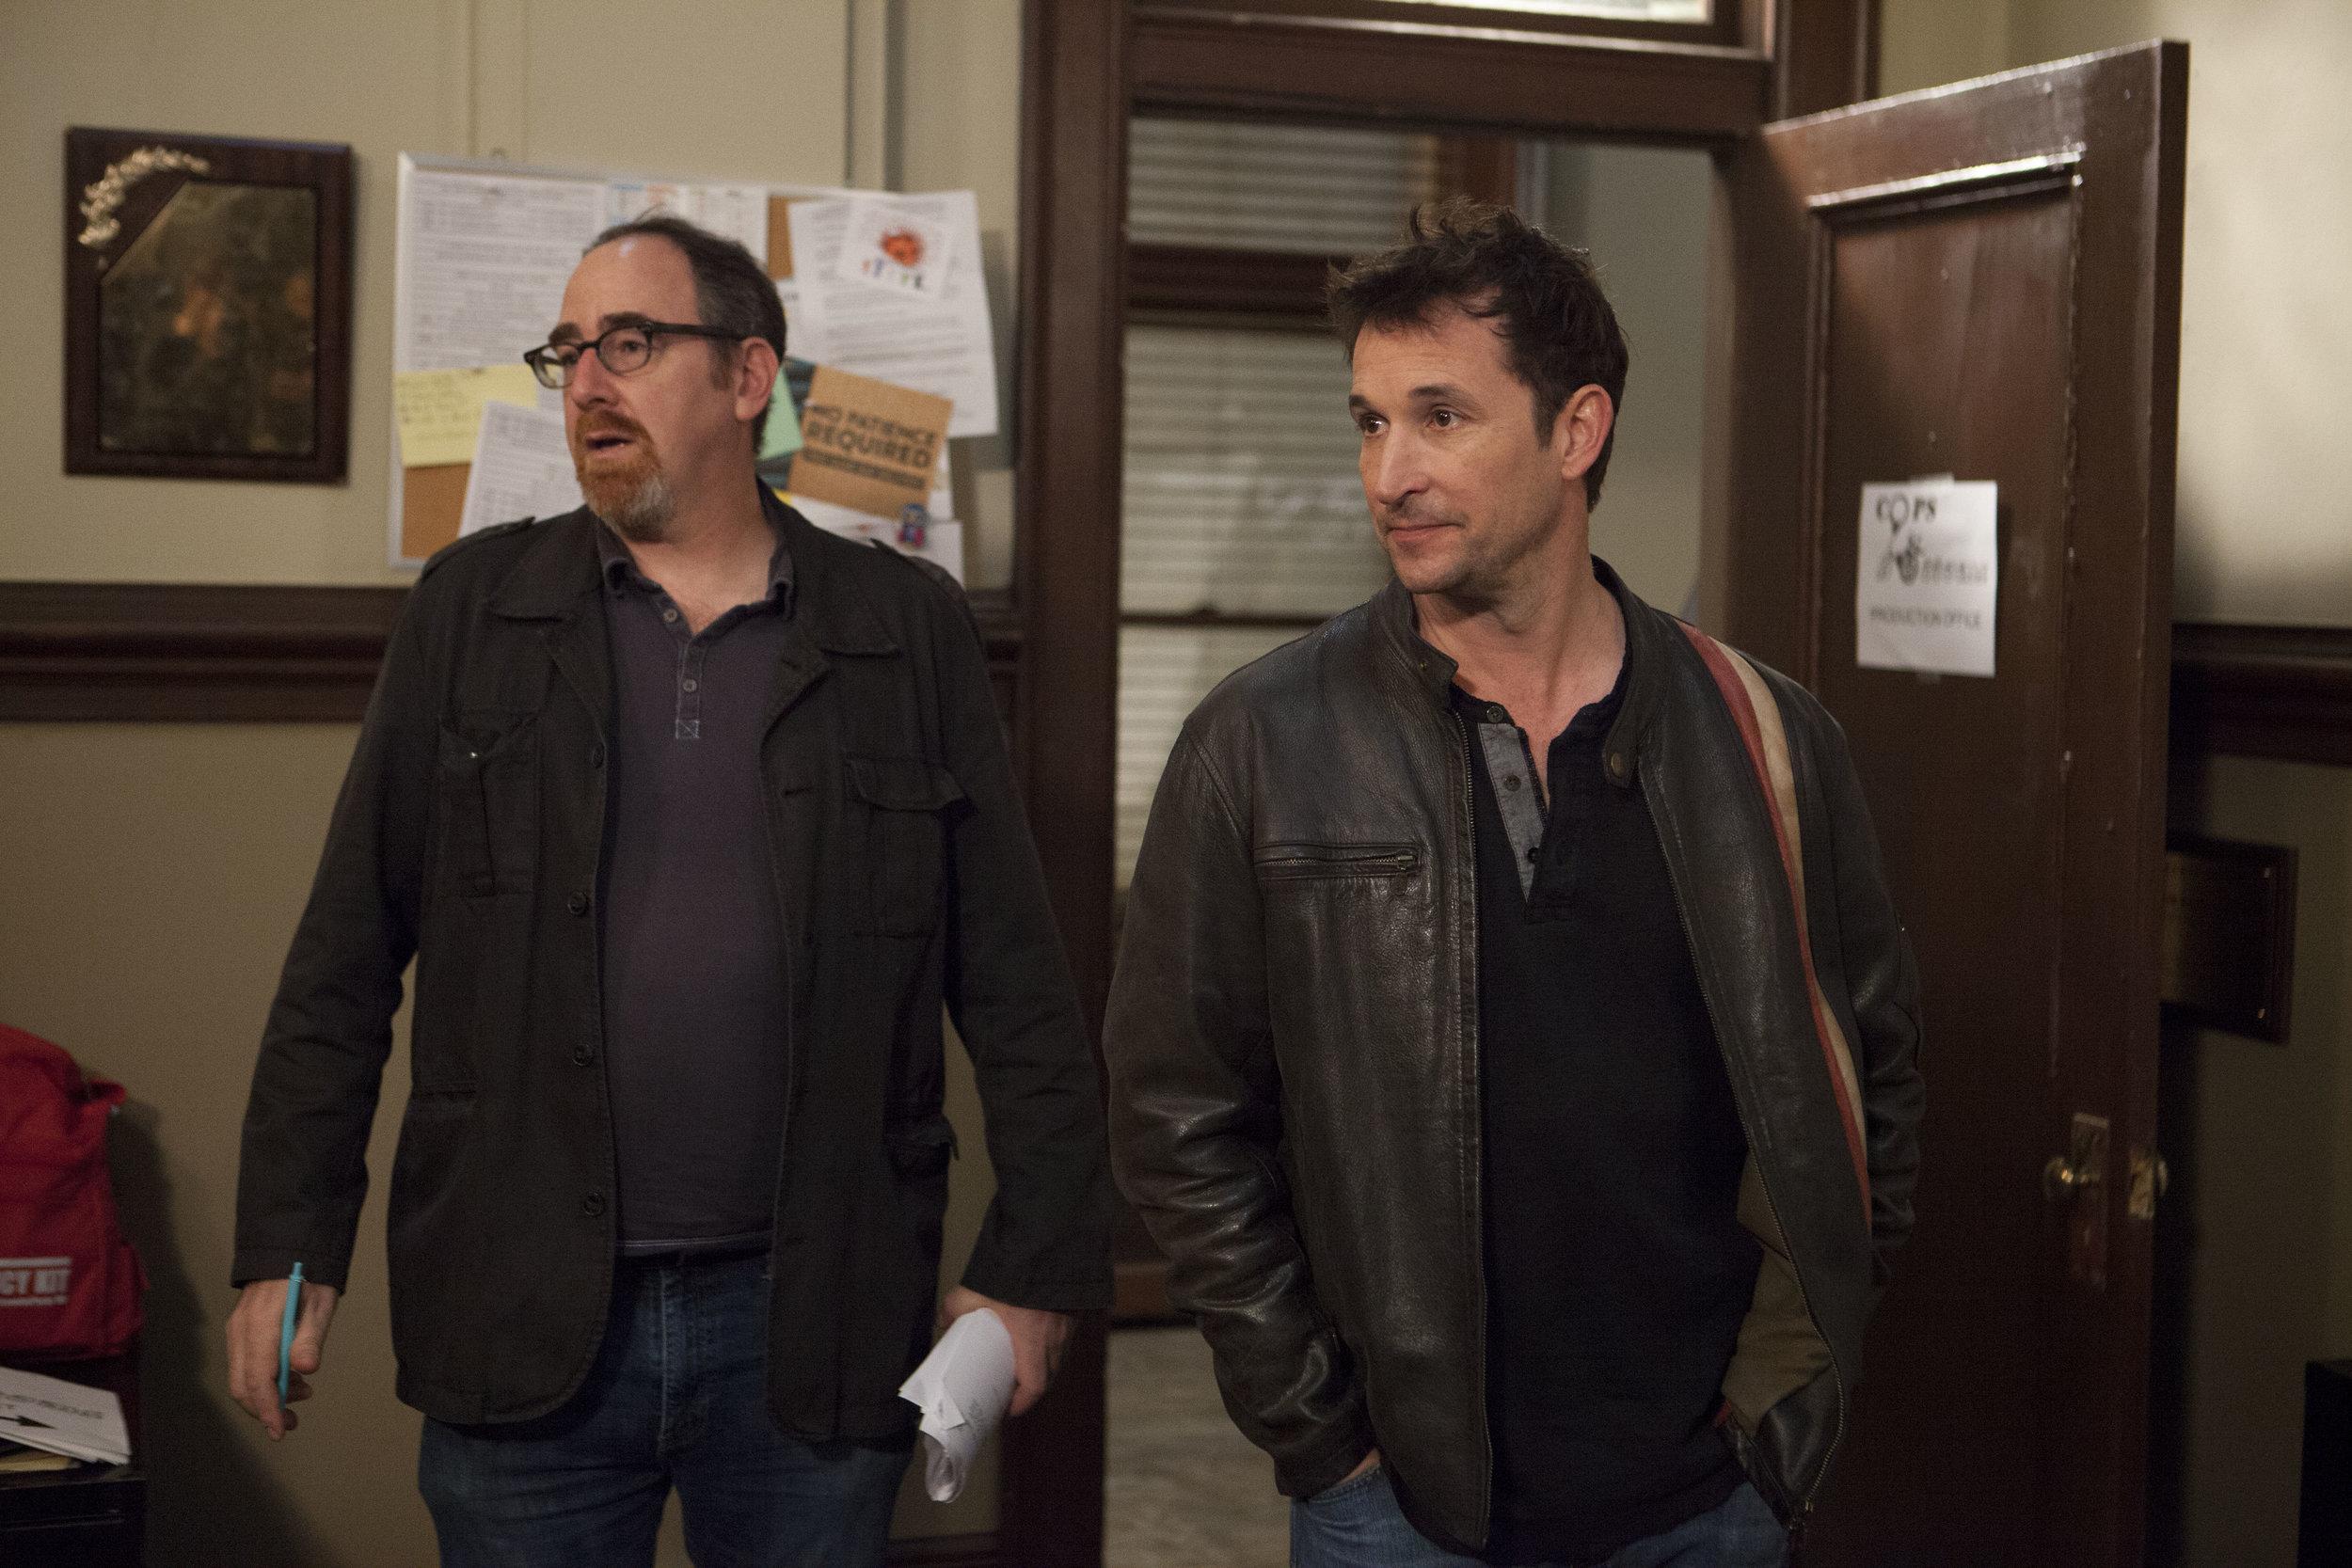 "1/16/16 Cops & Bottoms Production Office Scene. L to R: Jeff Rosenthal (Exec. Prod.), Noah Wyle (""Noah"")"